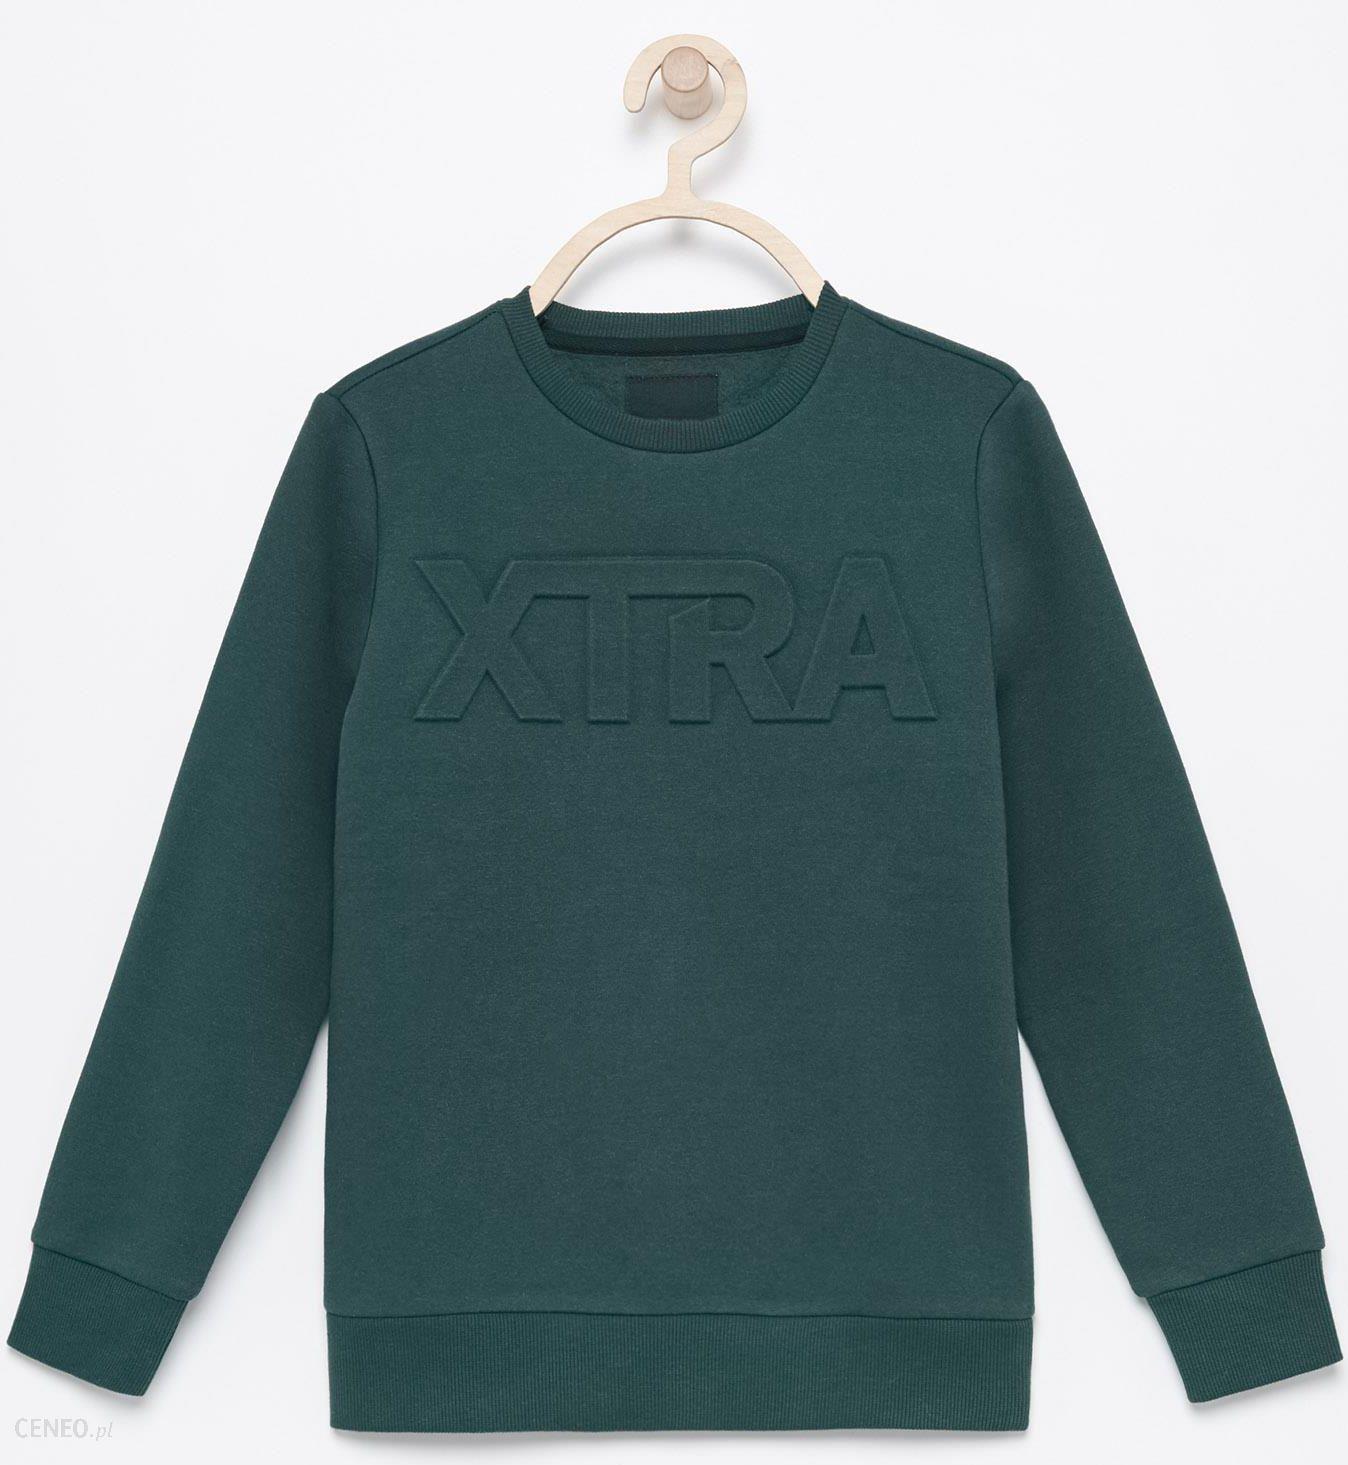 bluza adidas khaki czarny napis